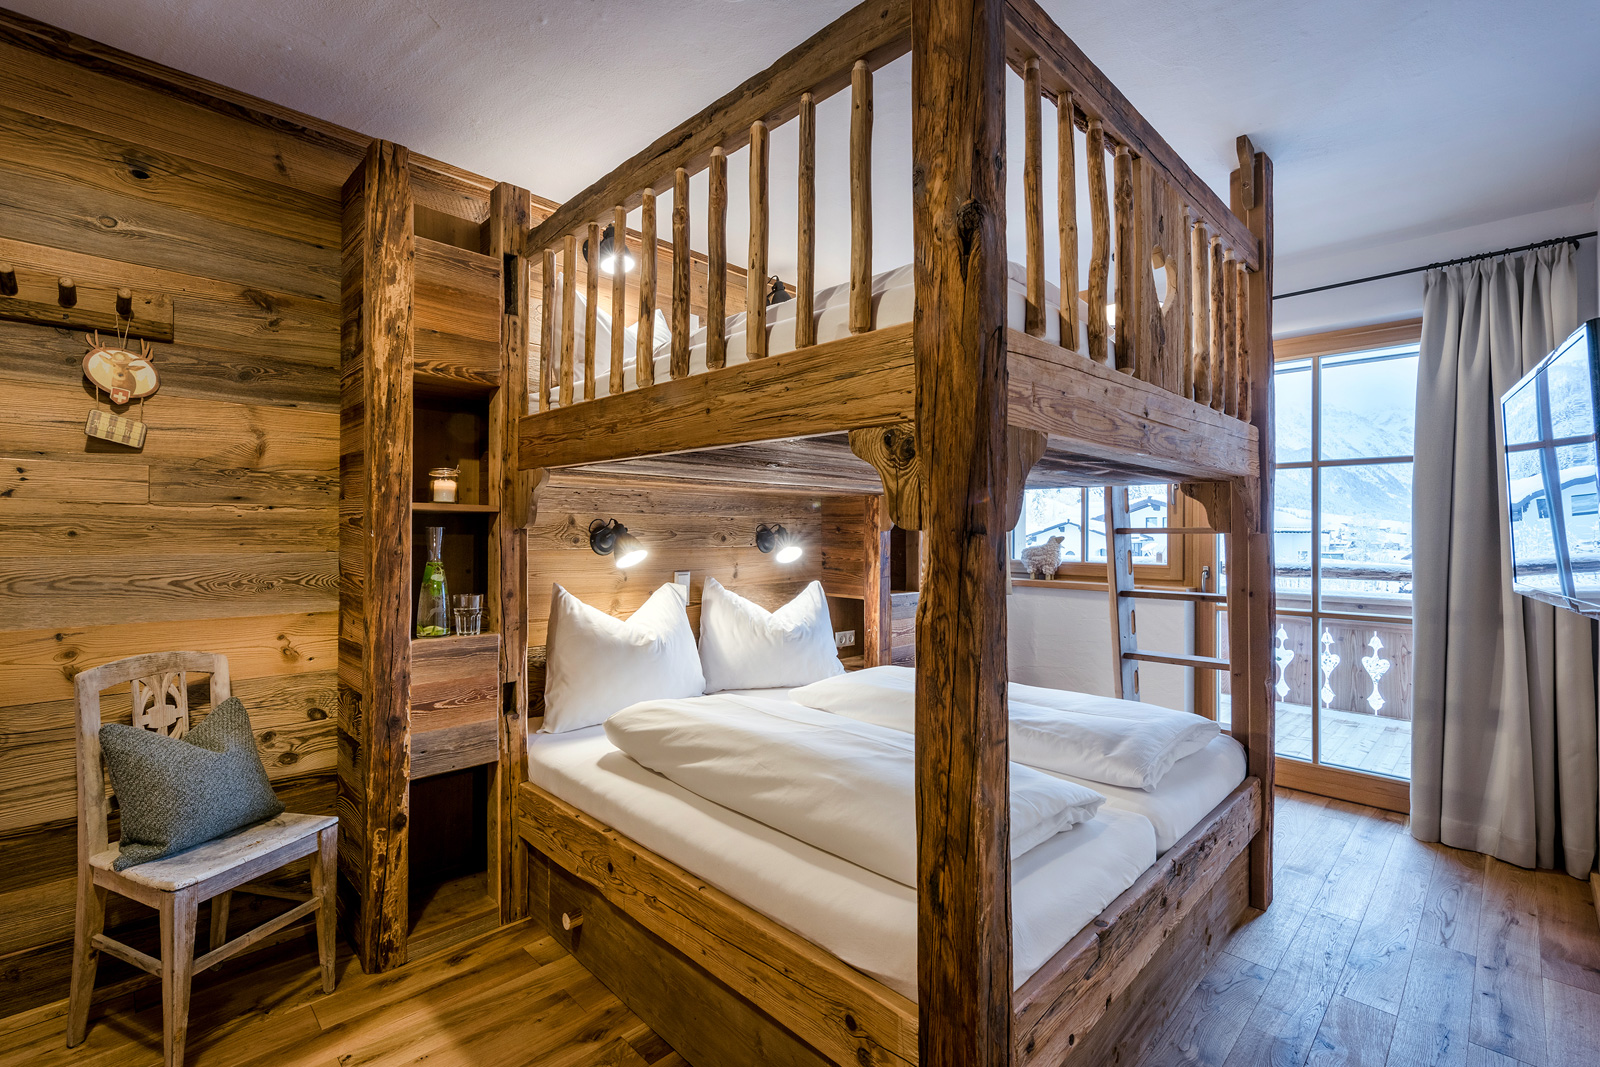 Doppelstockbetten der Lodge Jägersee